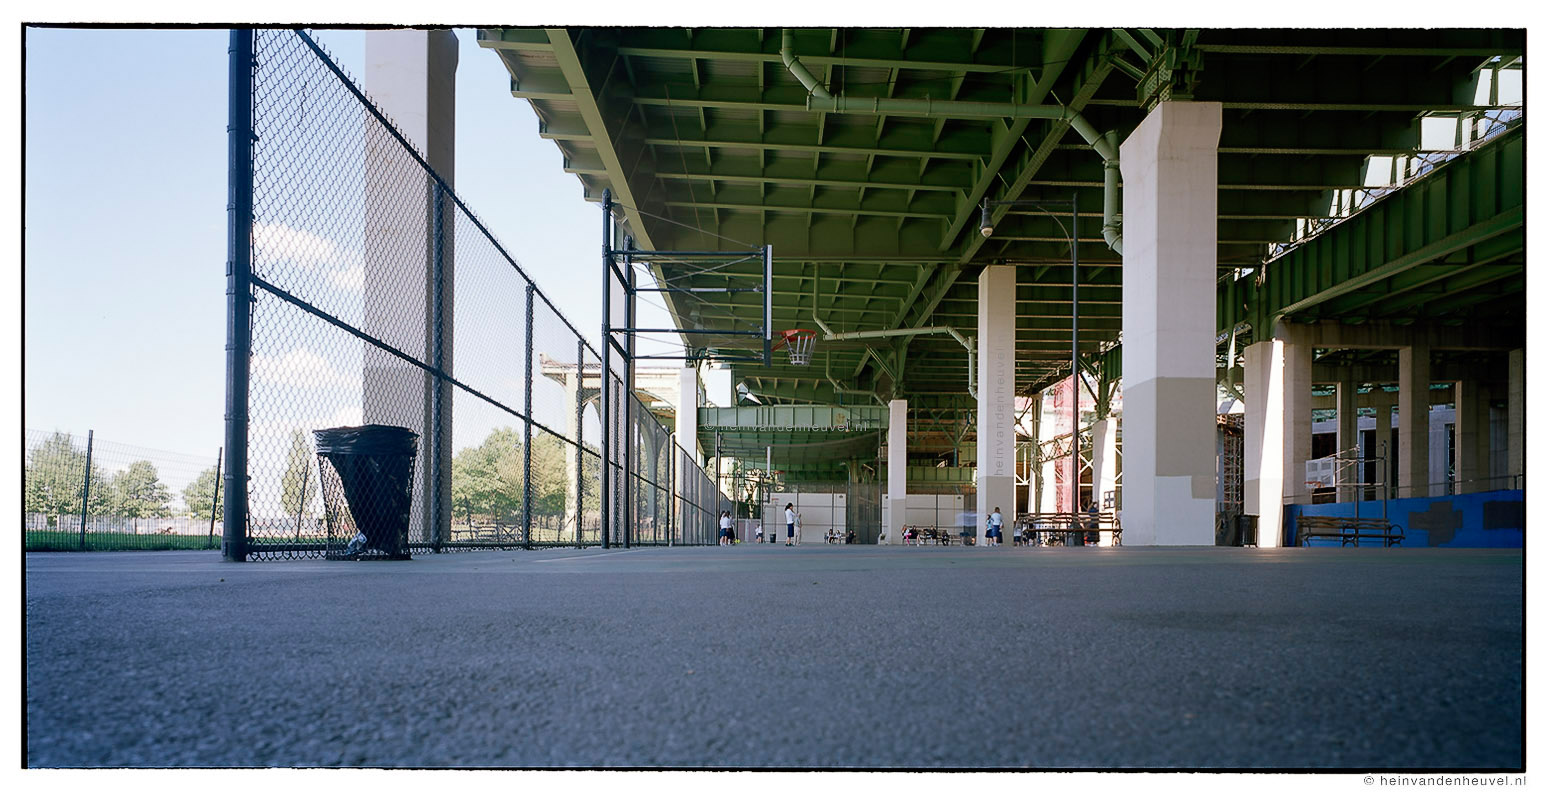 NewYork-Panorama-Artprint-Bridge.jpg